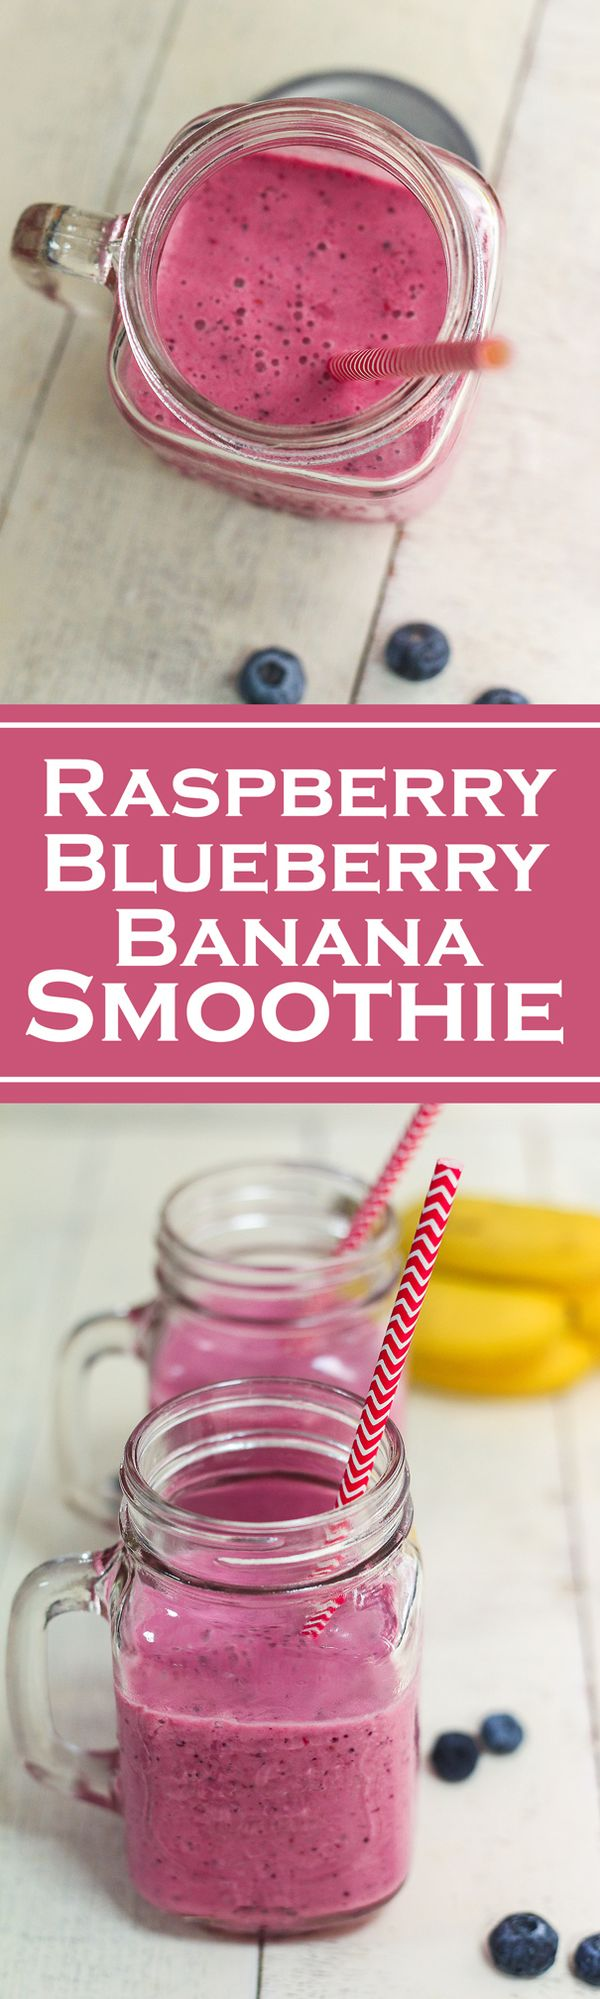 Raspberry Blueberry Banana Smoothie